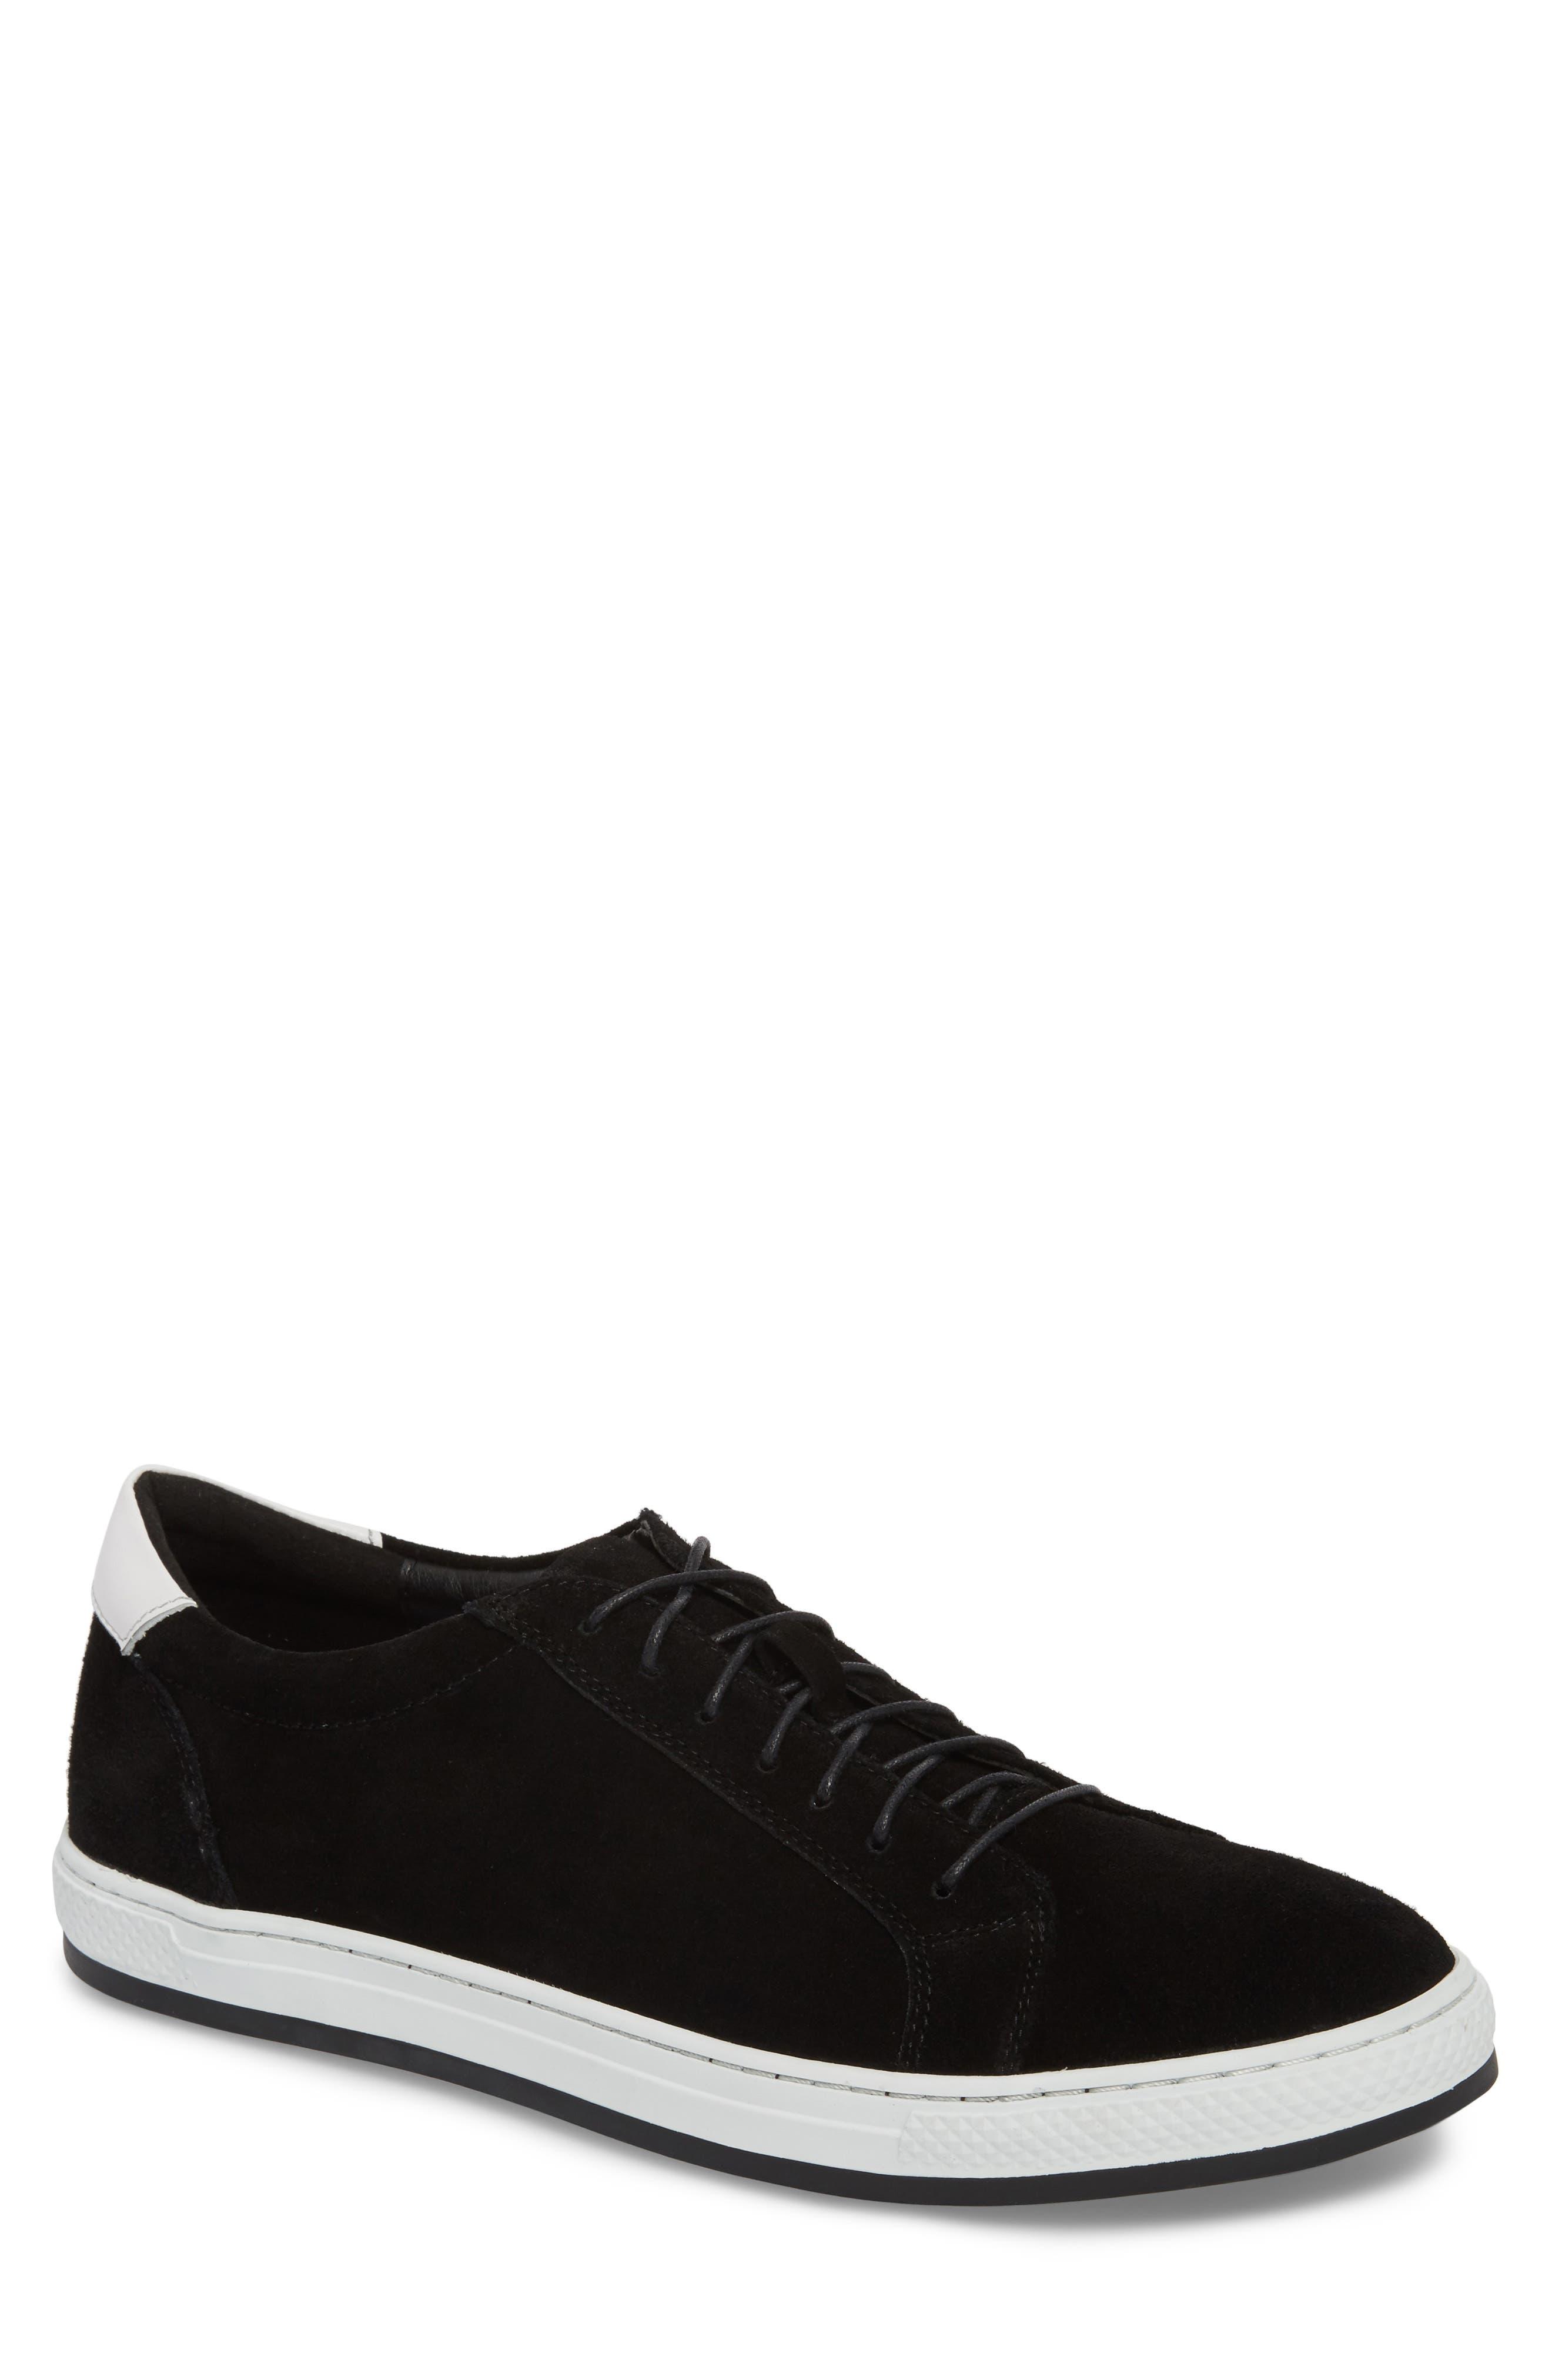 Queens Sneaker,                             Main thumbnail 1, color,                             Black Suede